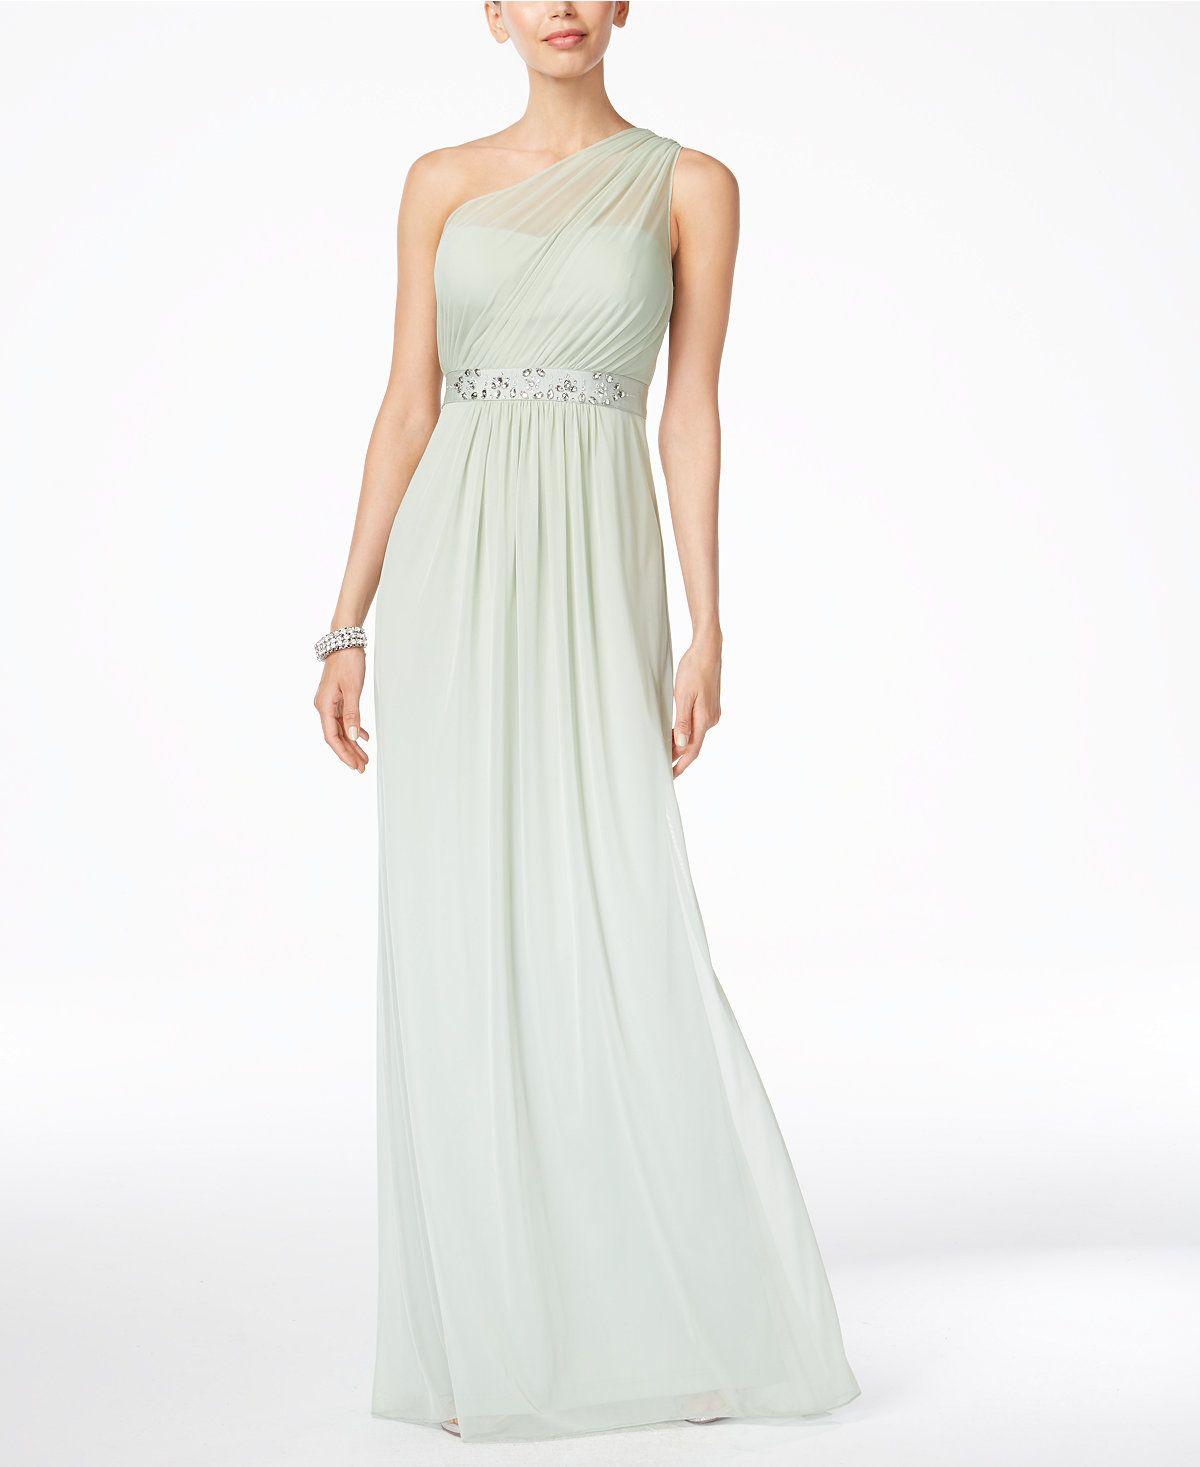 Adrianna papell embellished oneshoulder gown dresses